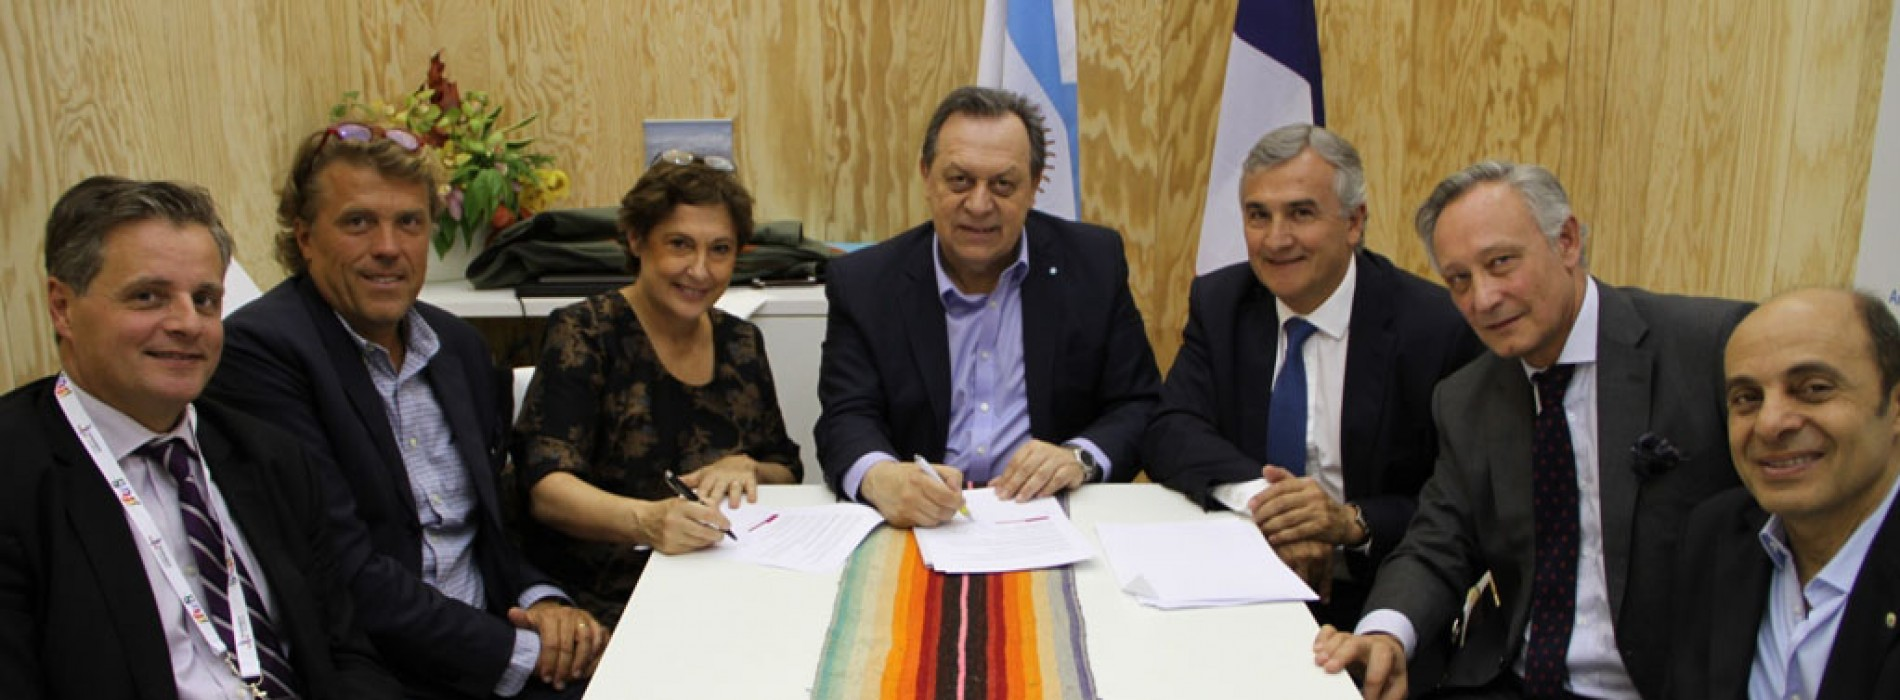 Argentina will be 'Guest Country' in La Cité du Vin 2019